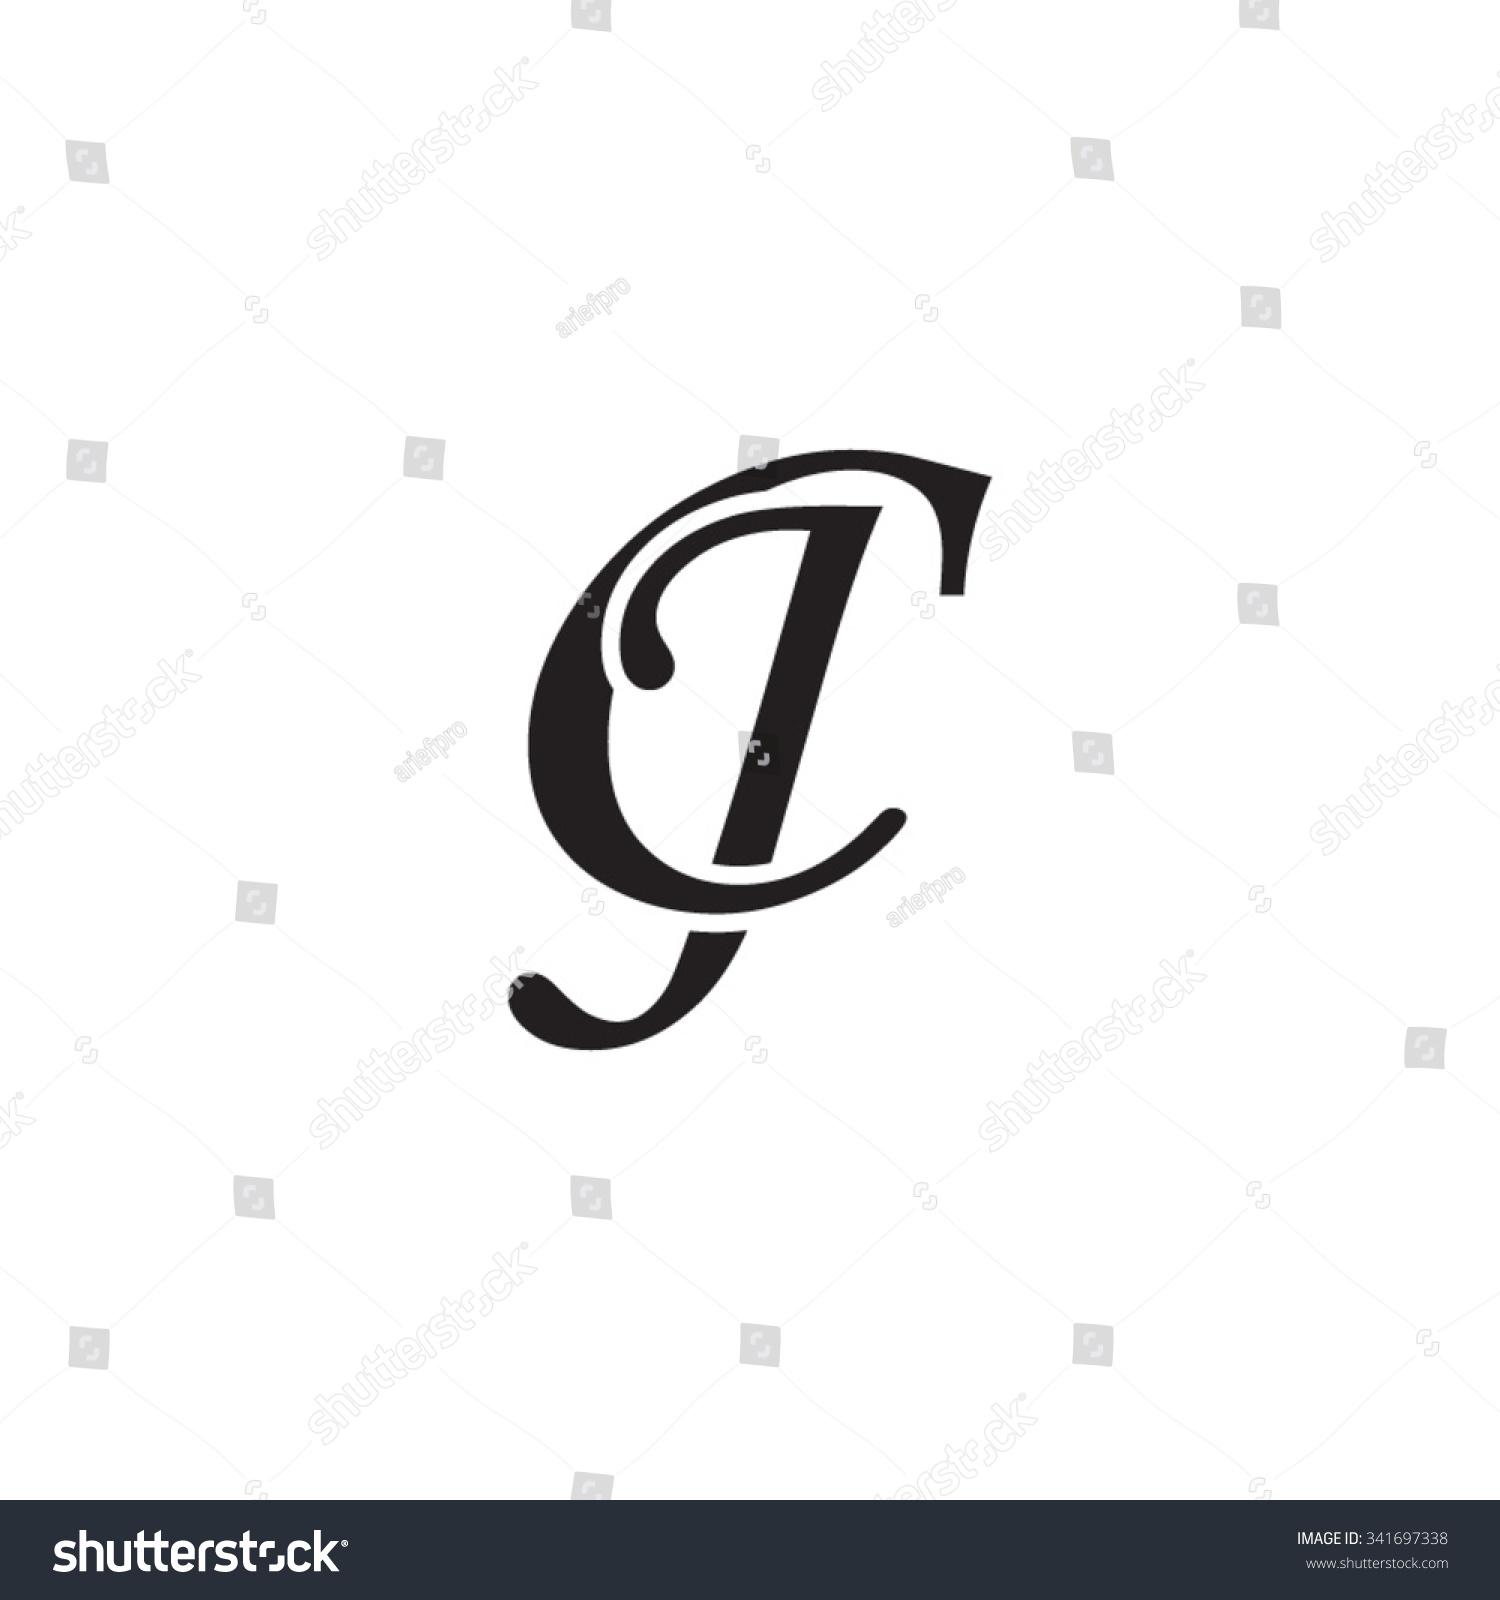 Cj Initial Monogram Logo Stock Vector 341697338 - Shutterstock